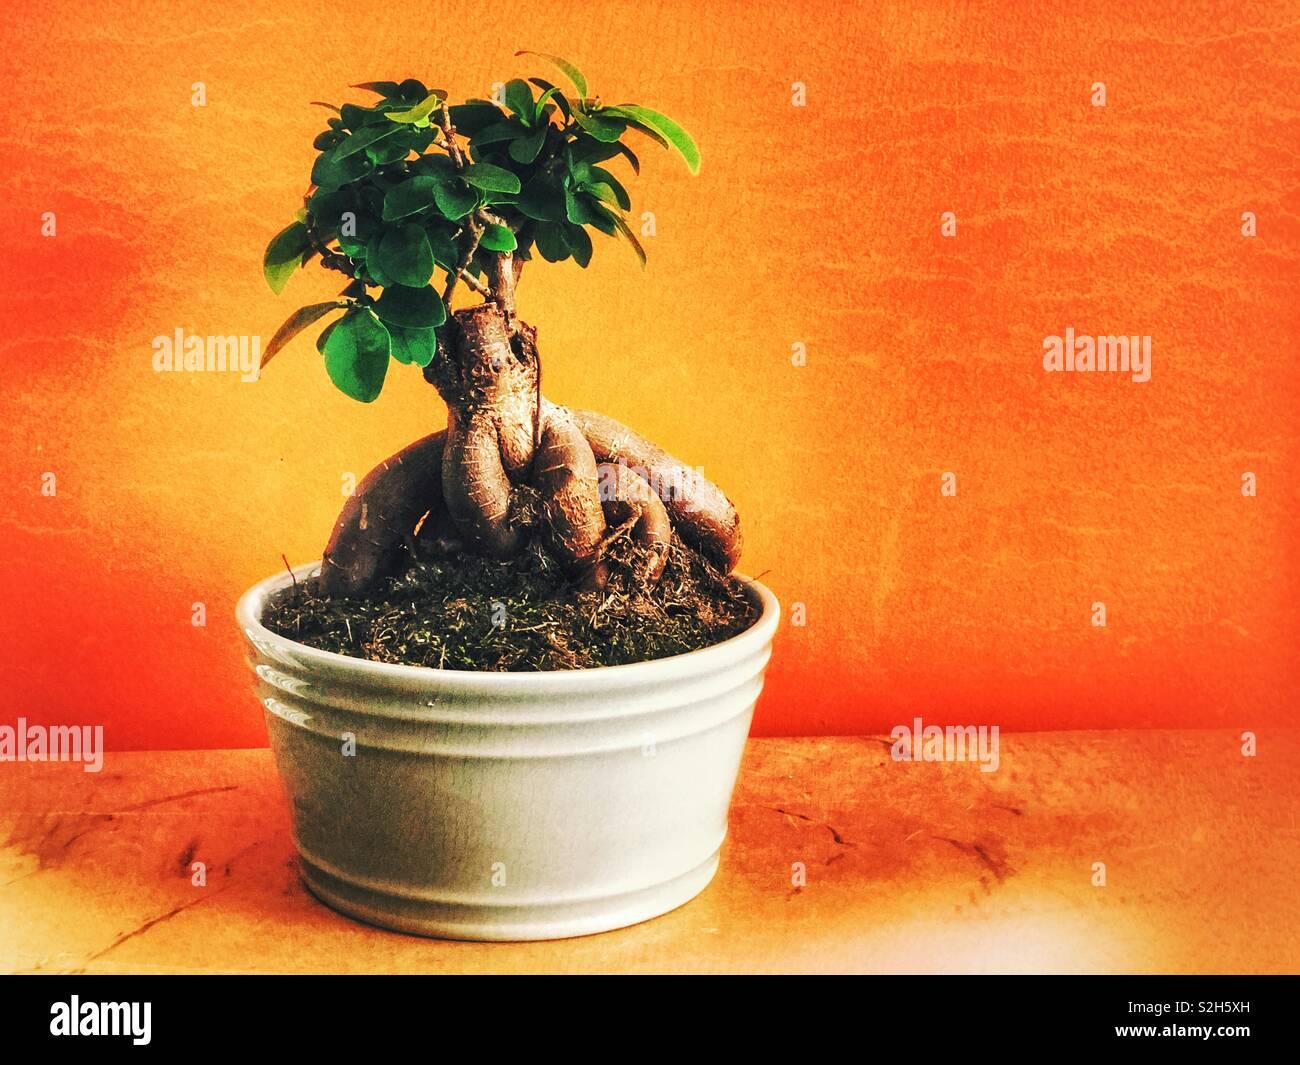 Bonsai (ginseng ficus) en una olla Imagen De Stock